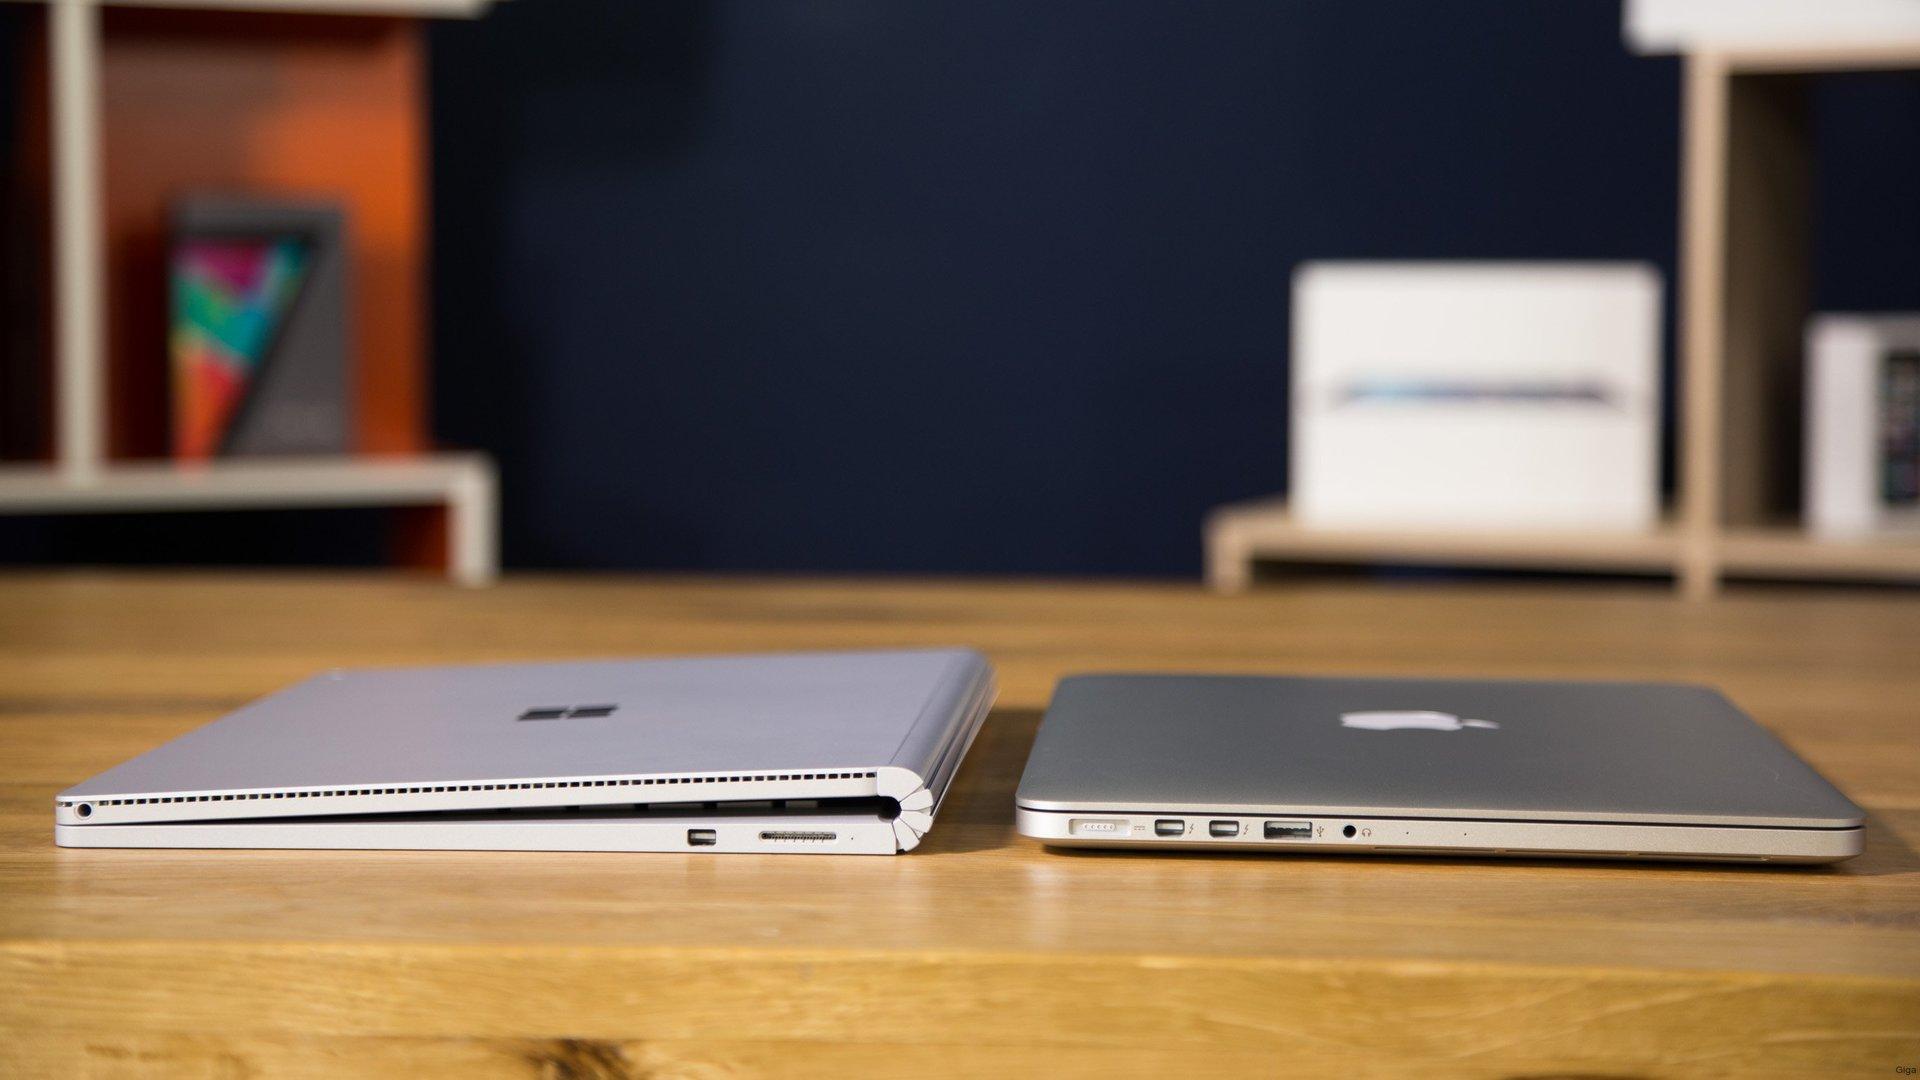 surface book vs macbook pro im vergleich giga. Black Bedroom Furniture Sets. Home Design Ideas